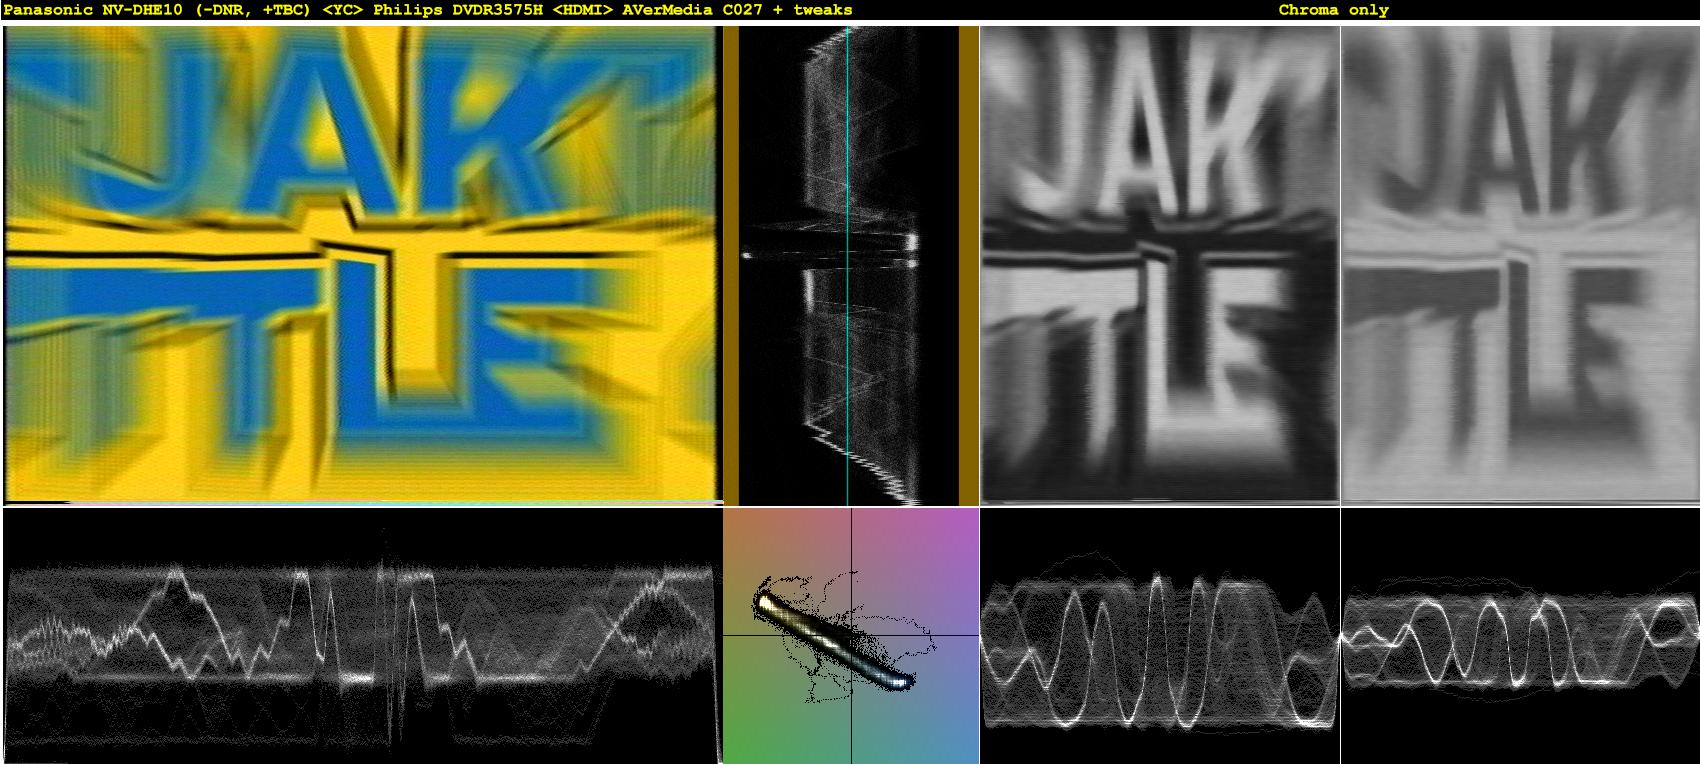 Click image for larger version  Name:0-05-05 - Panasonic NV-DHE10 (-DNR, +TBC).png Views:732 Size:1.15 MB ID:38007